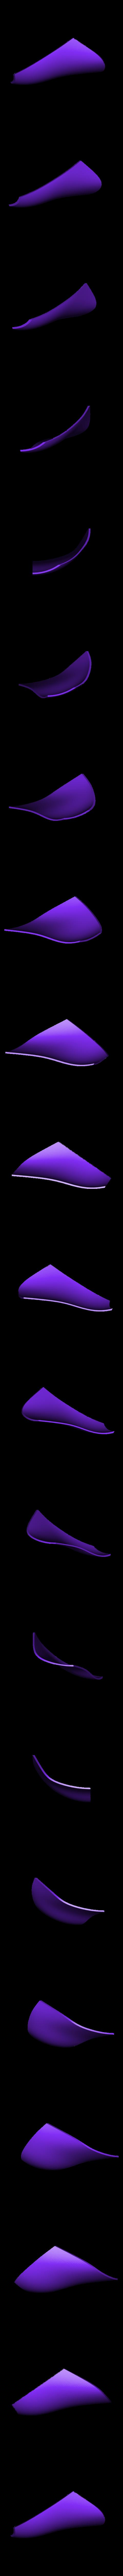 Hex3D_ImpGunner_Dome_Part7.stl Download STL file Imperial Gunner 3D Printable Helmet • 3D print design, Geoffro